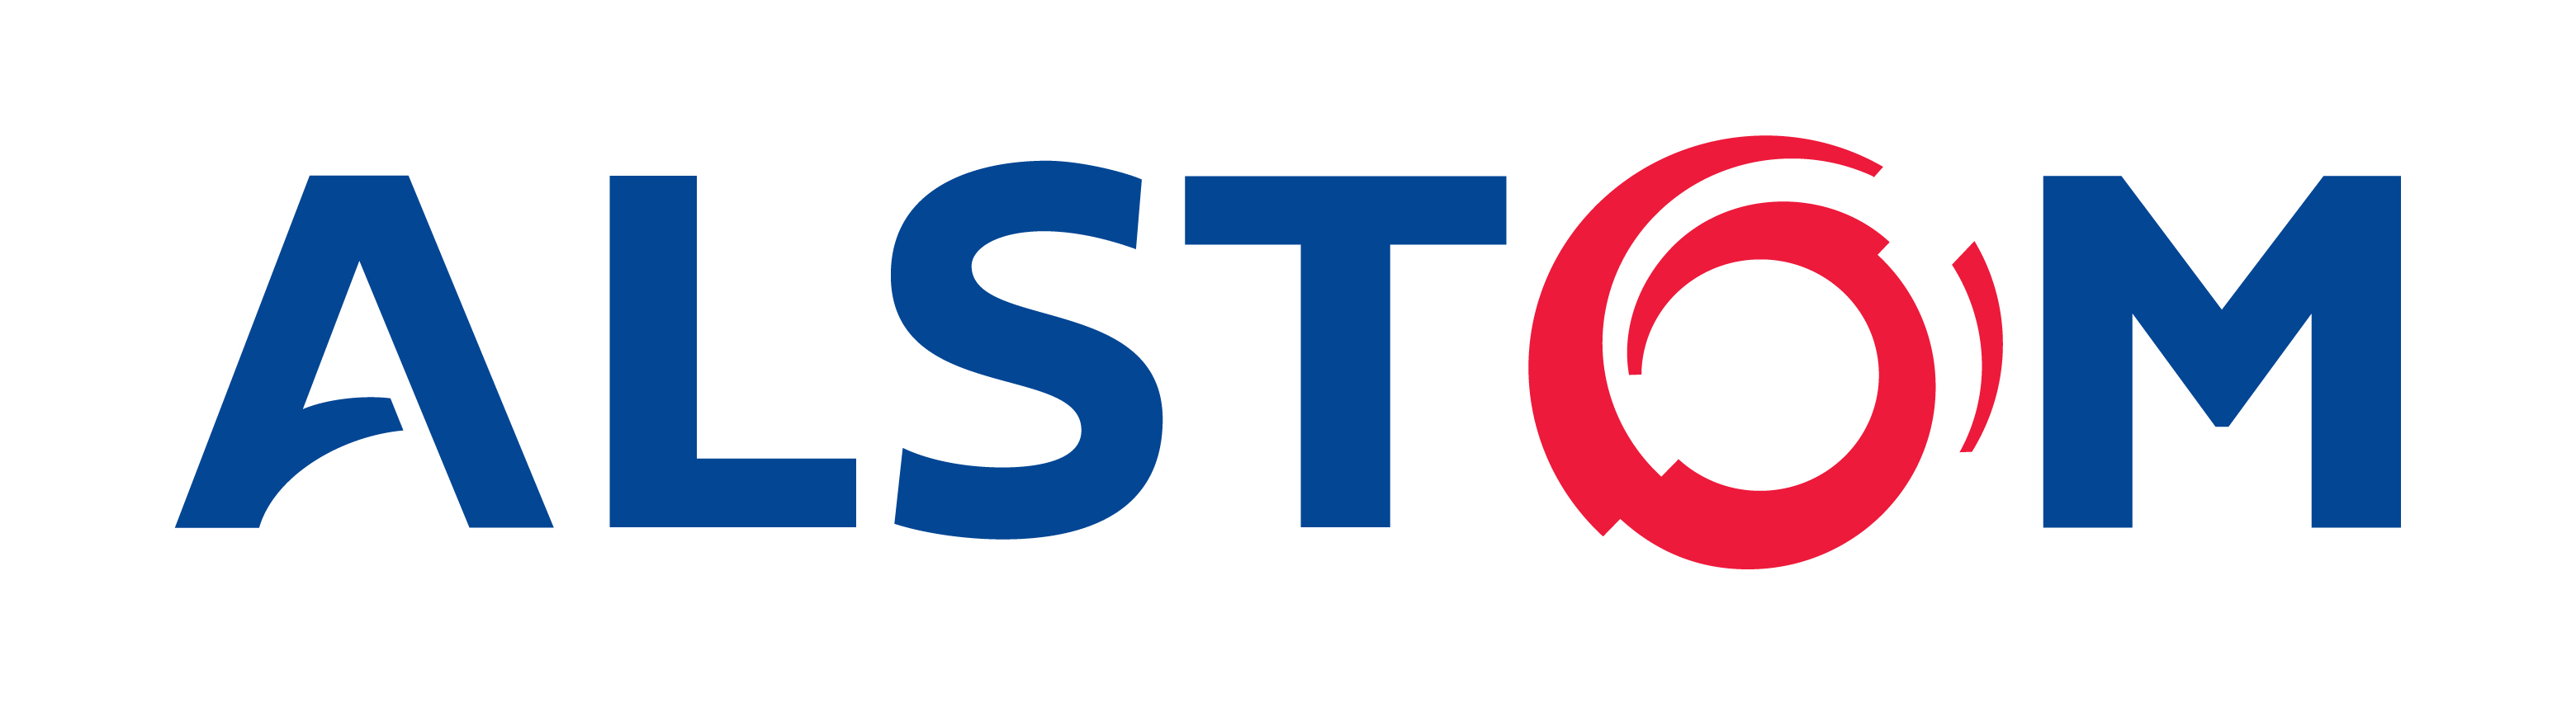 IPH Customer - Alstom